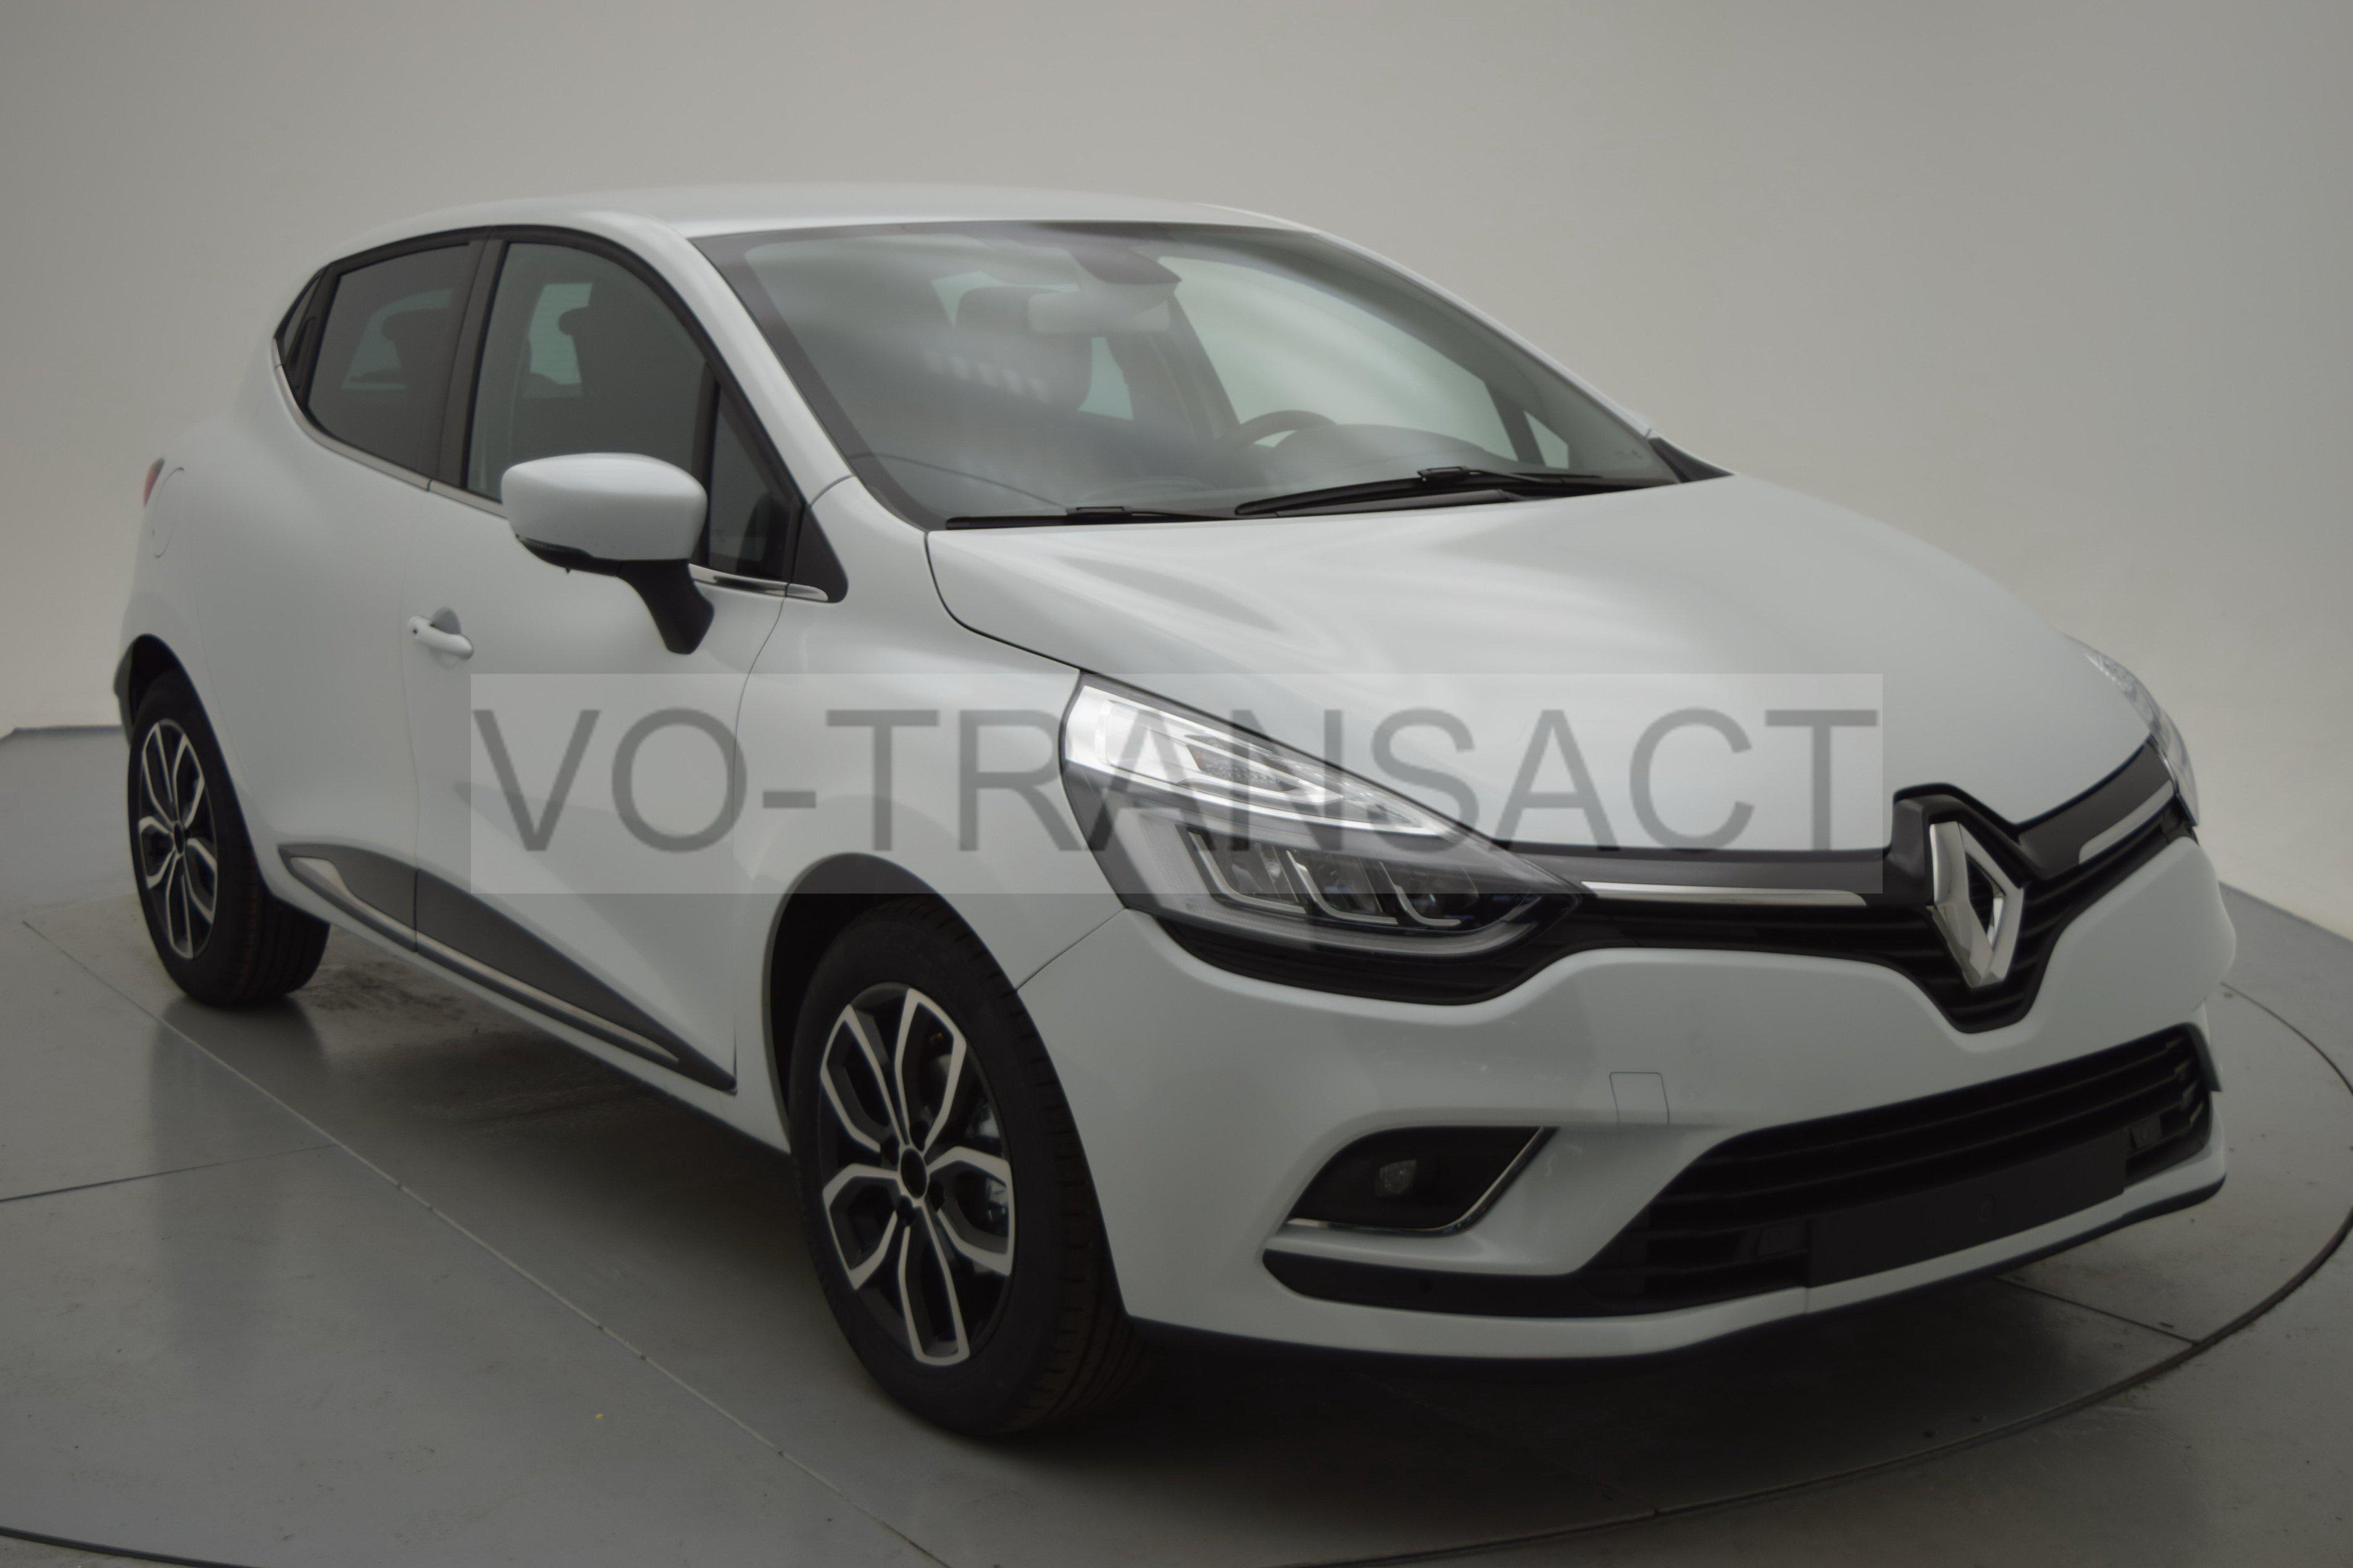 Renault Clio Iv Cailloux Sur Fontaines 11900374 Vo Transact